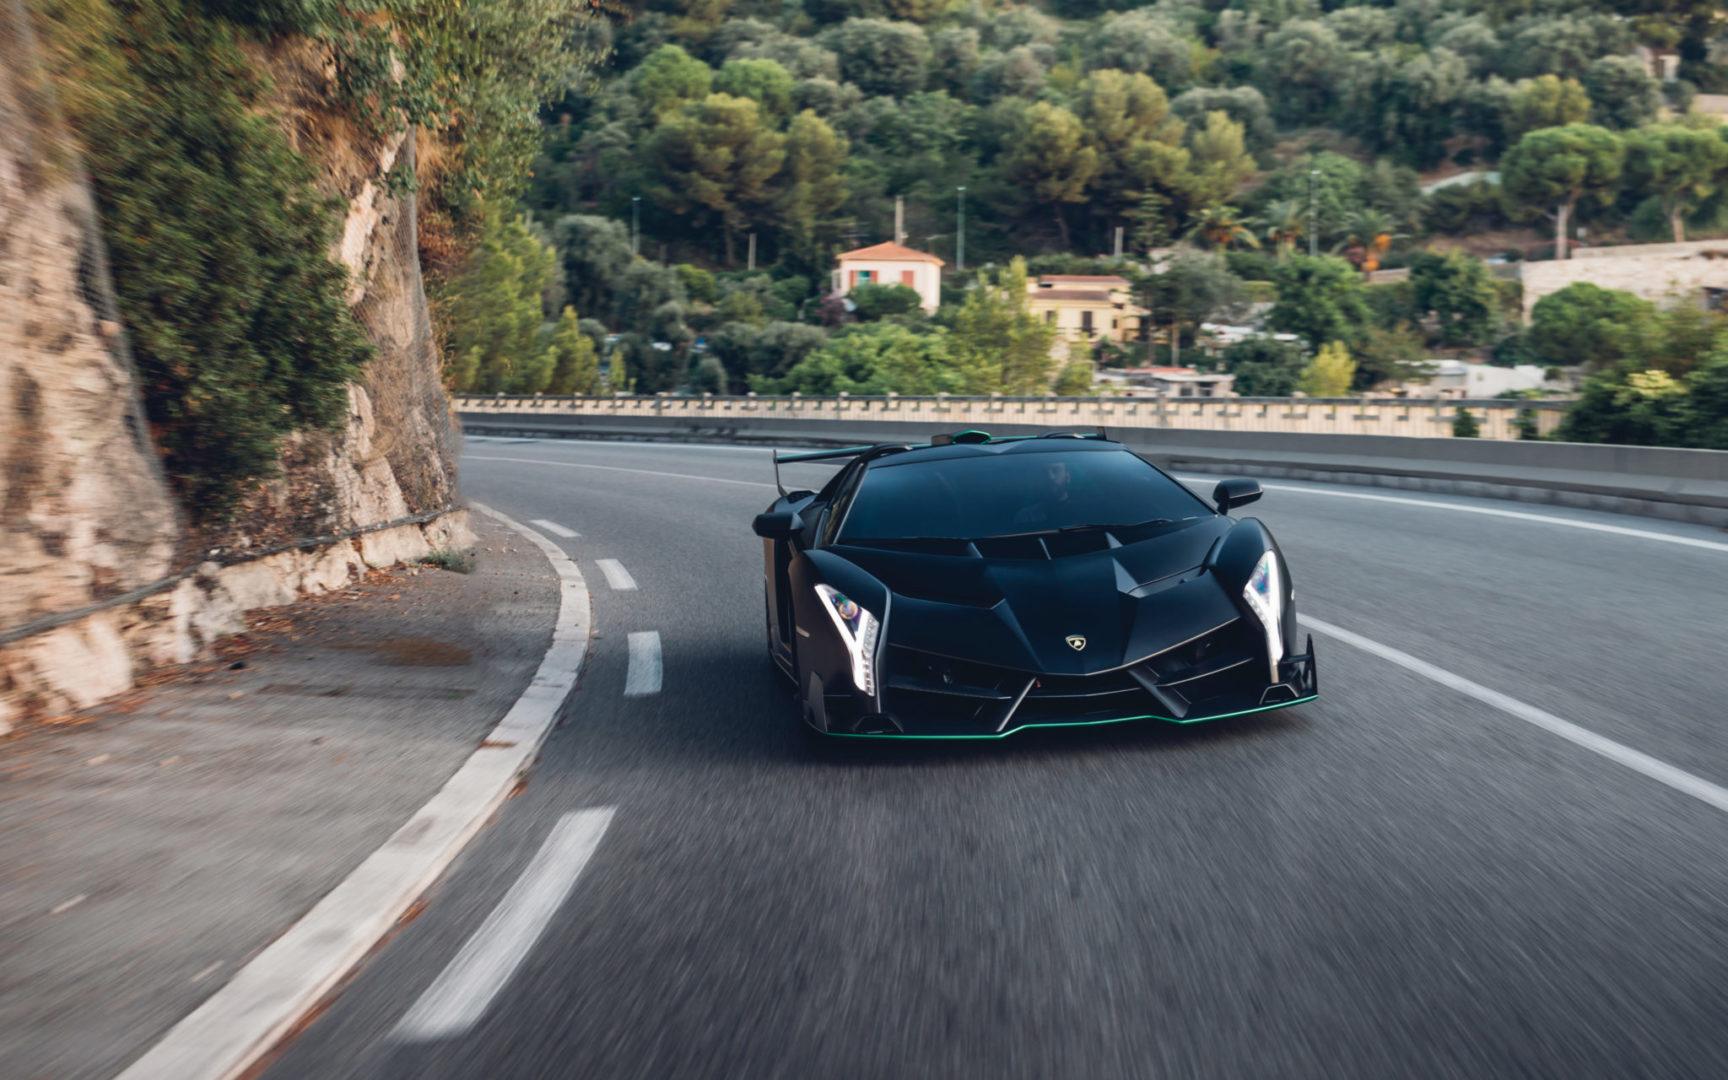 2015-Lamborghini-Veneno-Roadster-_13